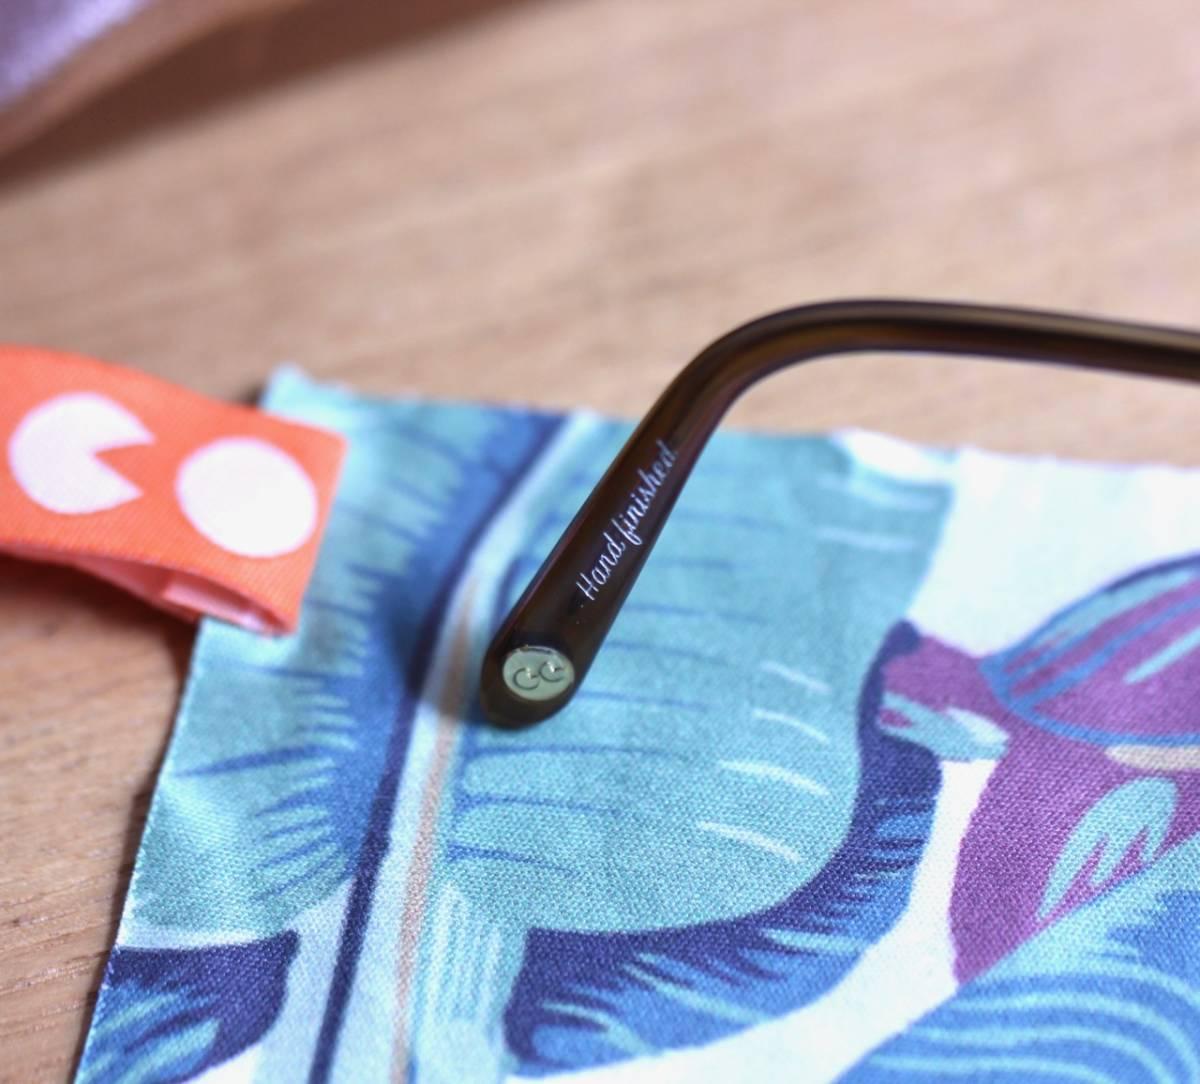 GLCO ギャレットレイト Hampton 44 眼鏡/サングラス兼用セルフレーム(GARRETT LEIGHT California Optical/オリバーピープルズ系列ブランド)_画像5